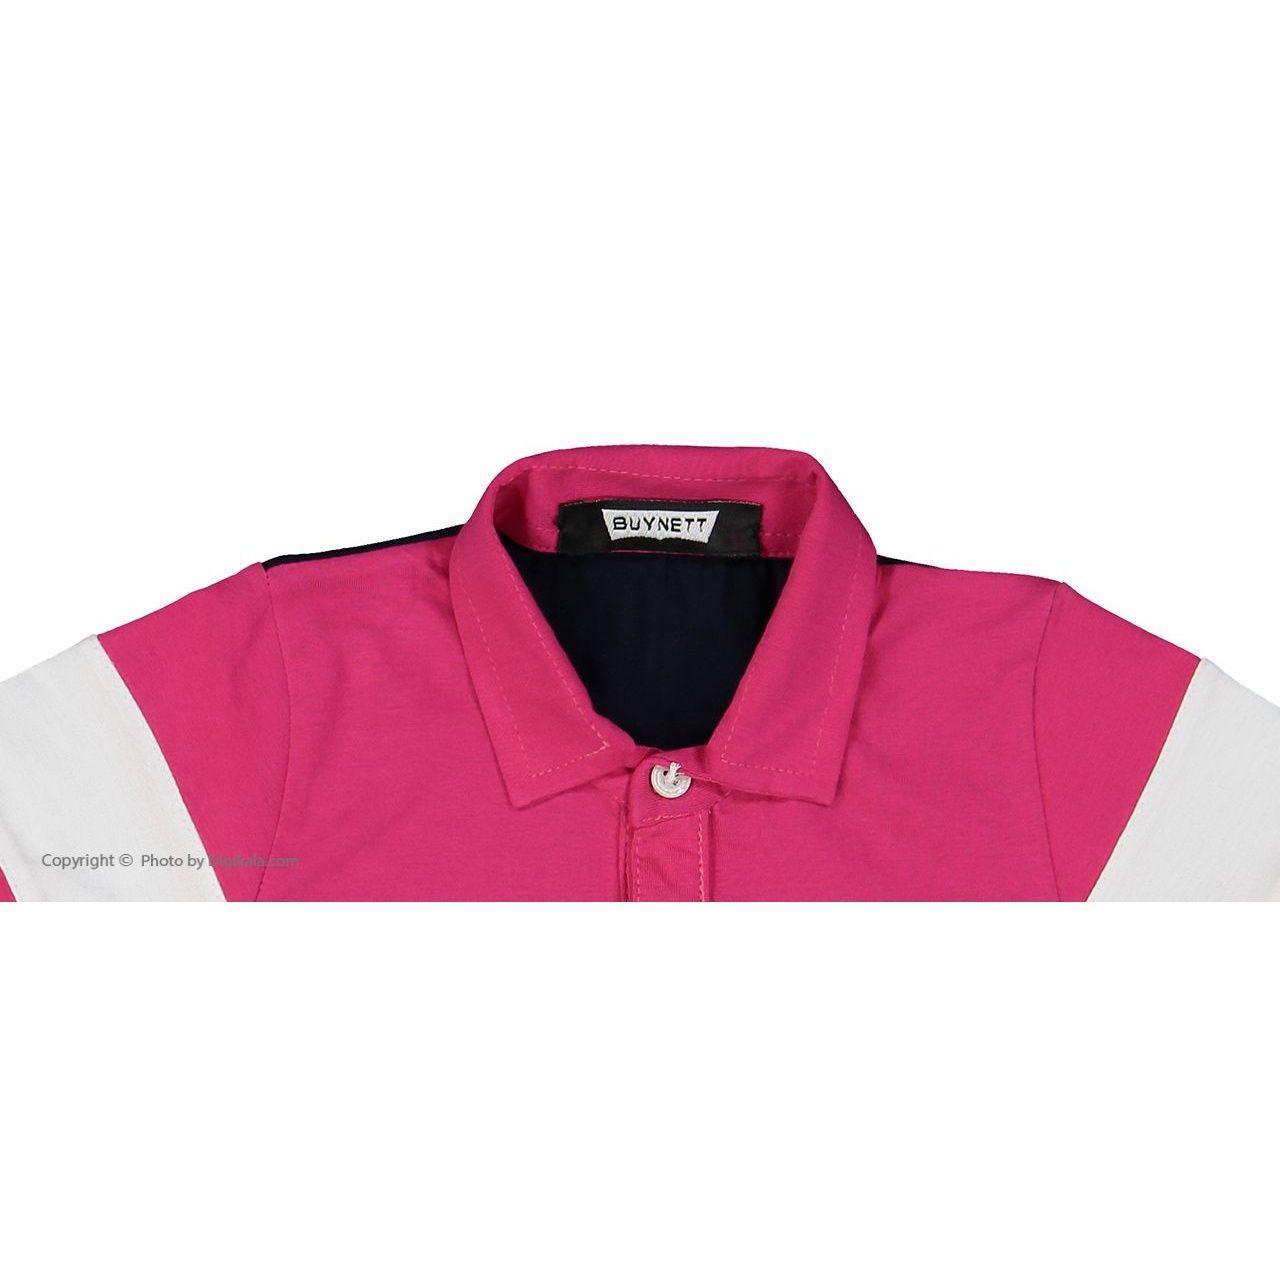 پولو شرت آستین کوتاه پسرانه بای نت کد btt11 -  - 2